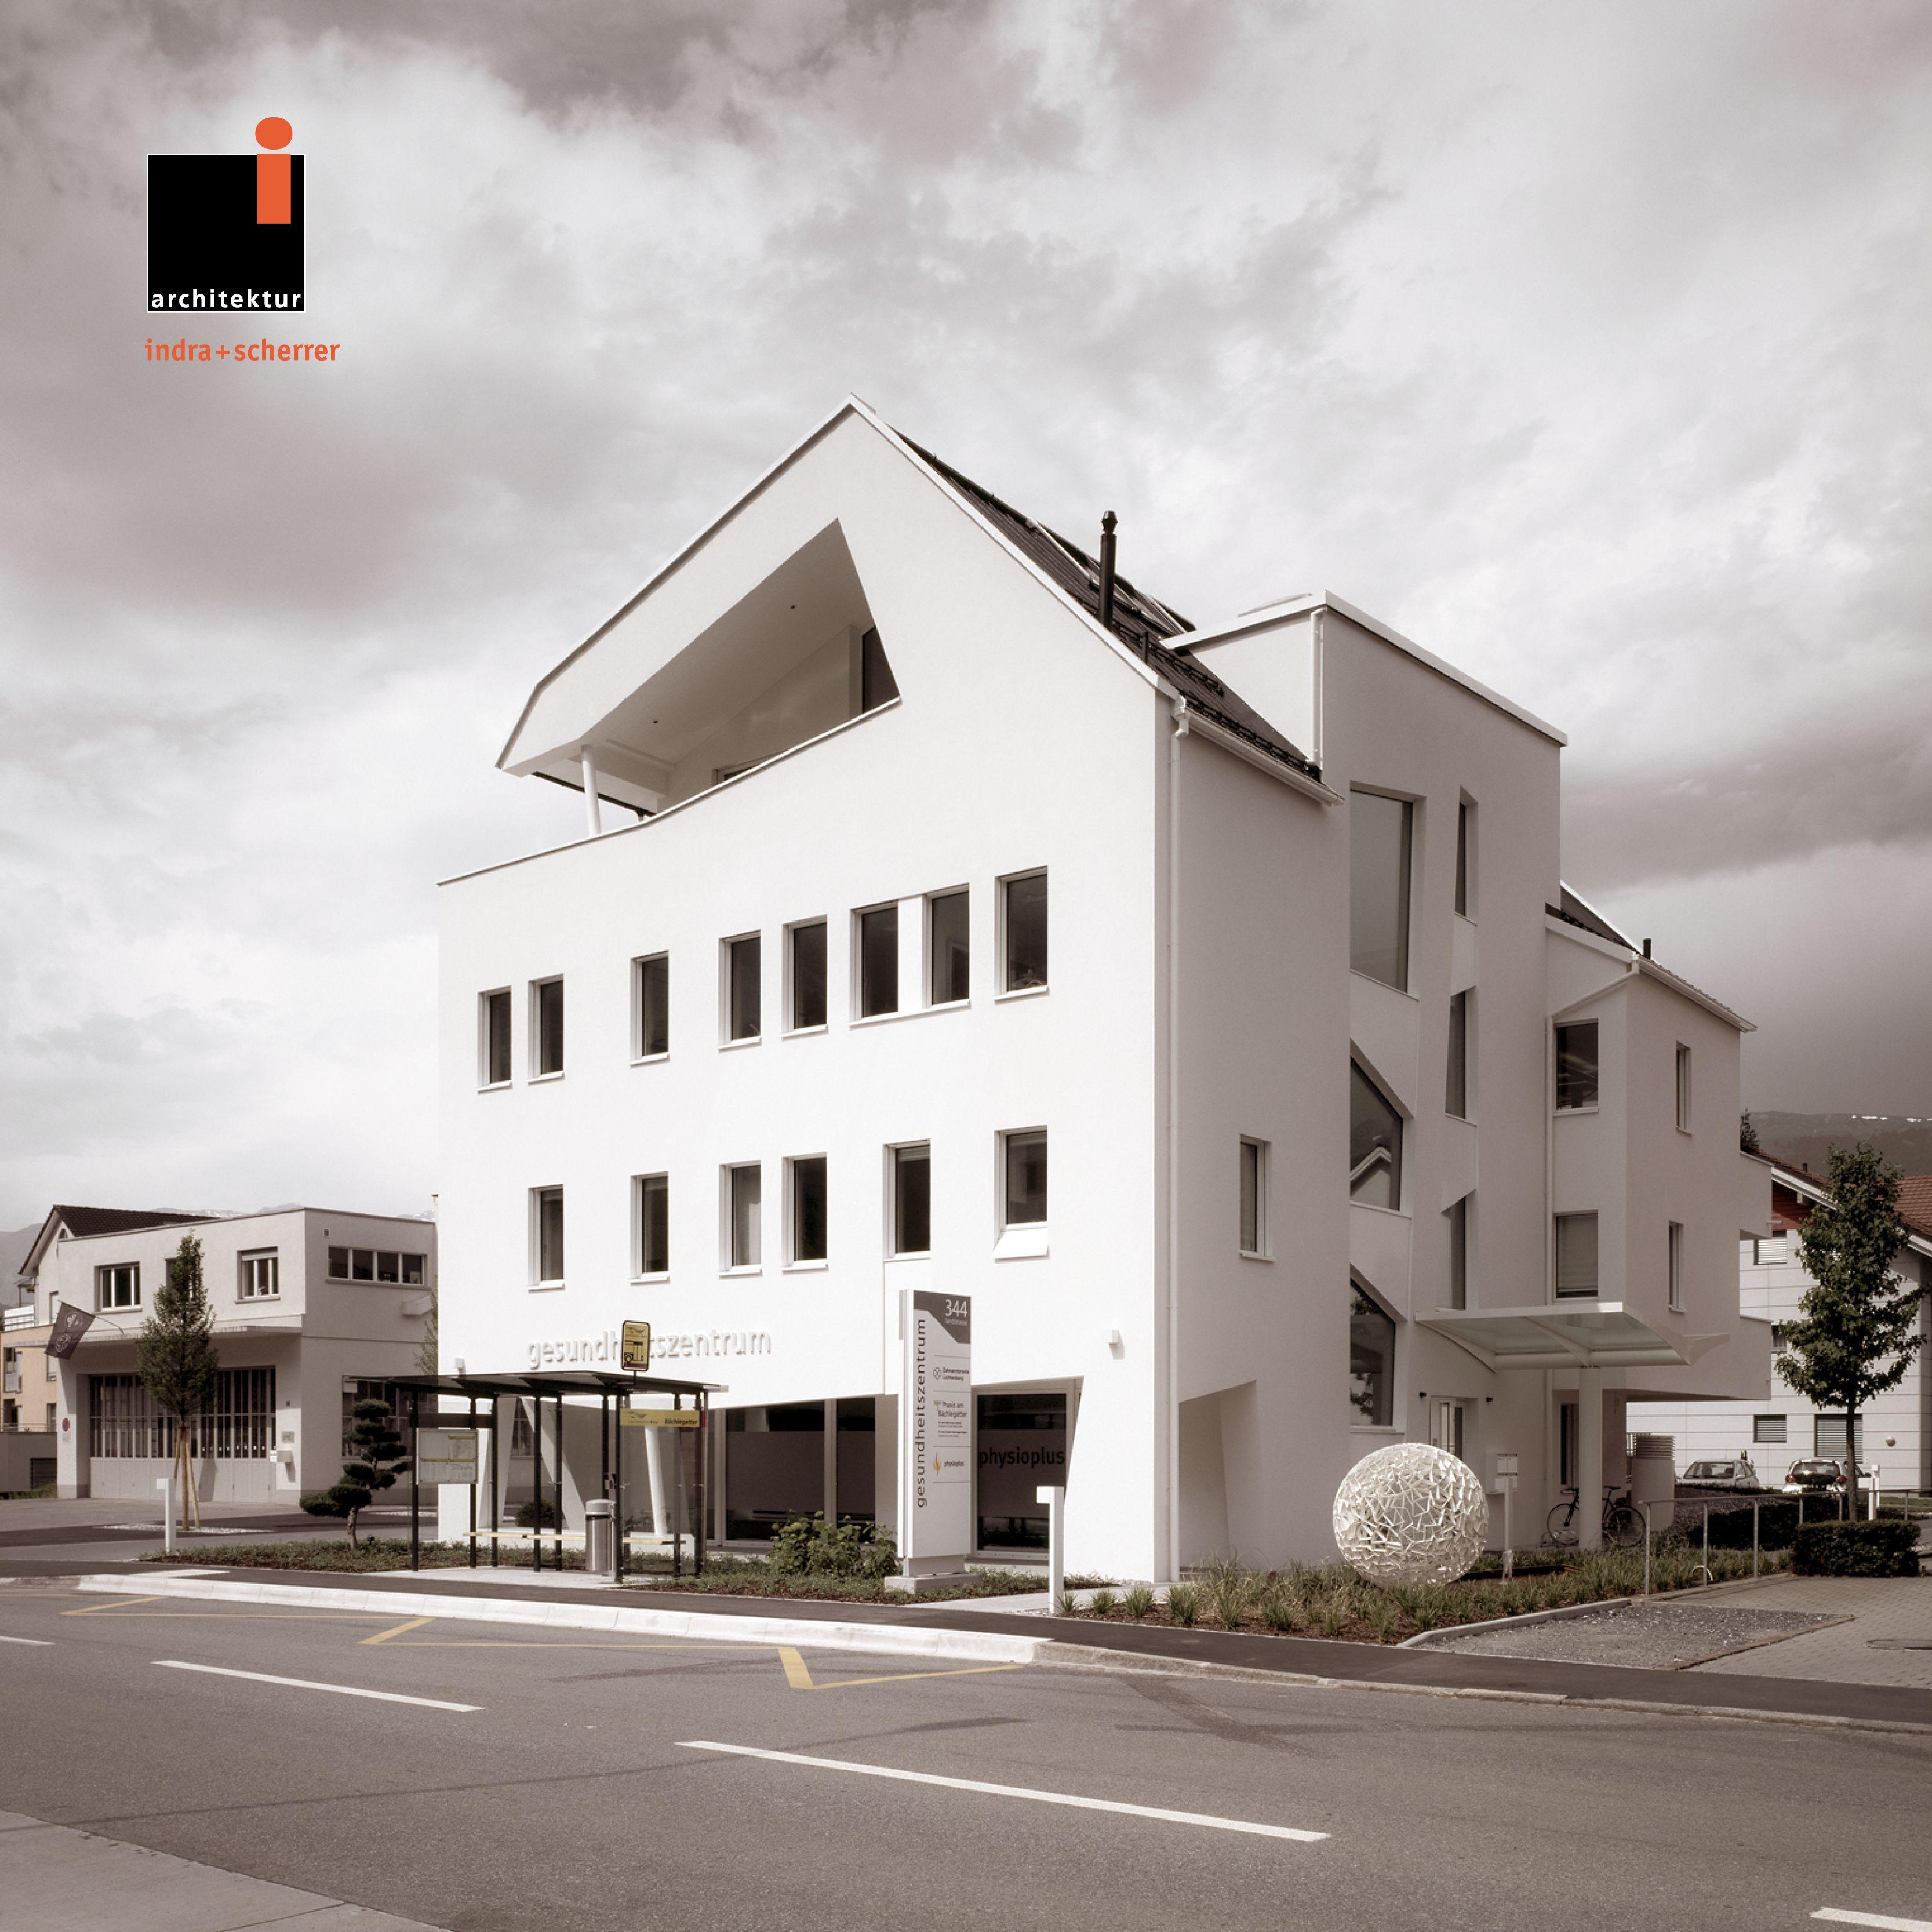 #indrascherrer #architecturephotography #architecturedesign #appartmentdesign #differentthanothers #entrancedesign #deconstructvism #whitefacade #balcony #healthcenter #diagonalarchitecture